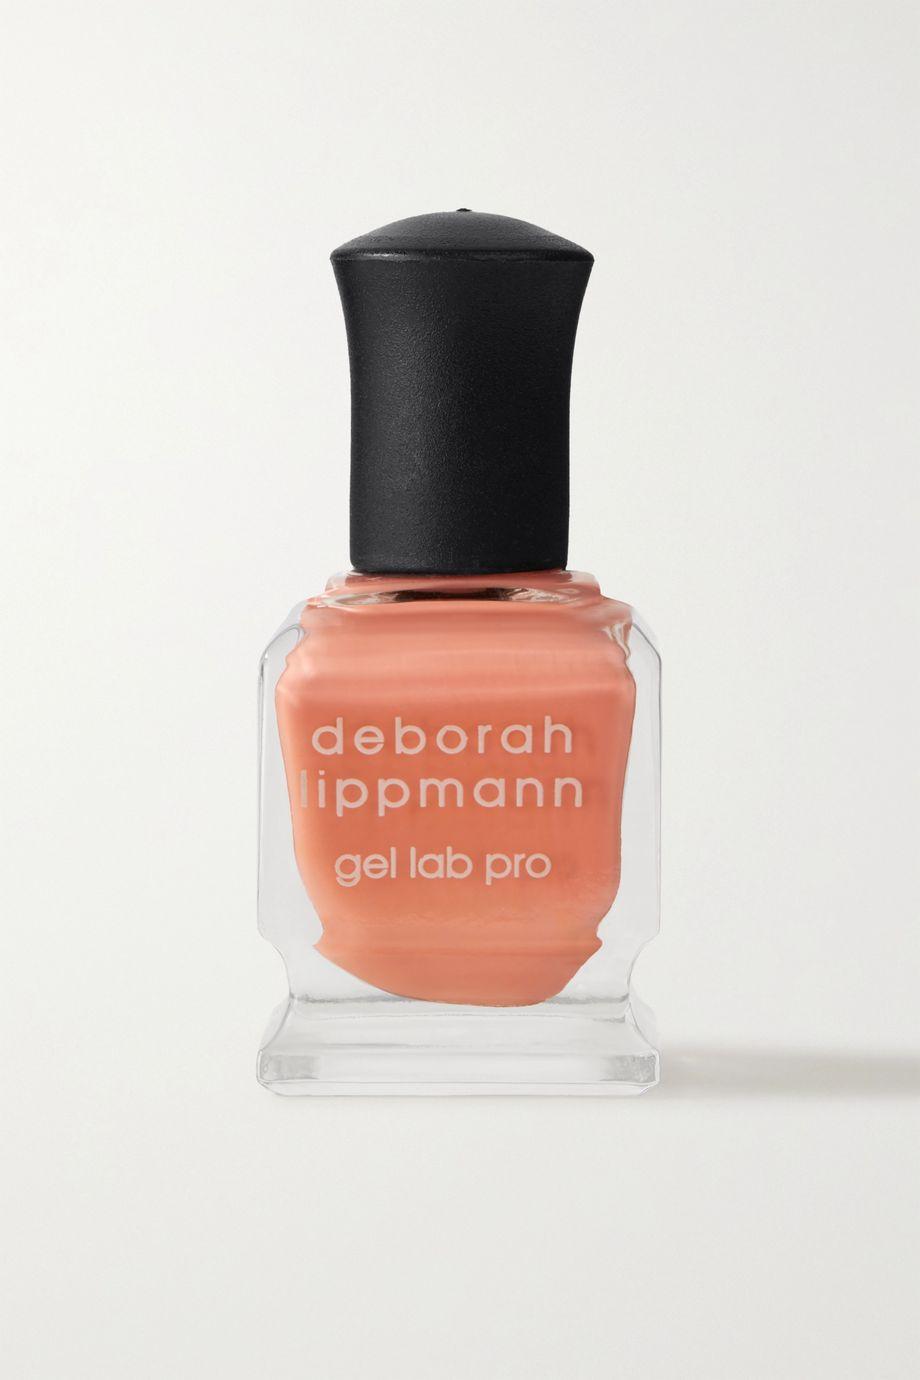 Deborah Lippmann Gel Lab Pro Nail Polish - Everytime We Touch